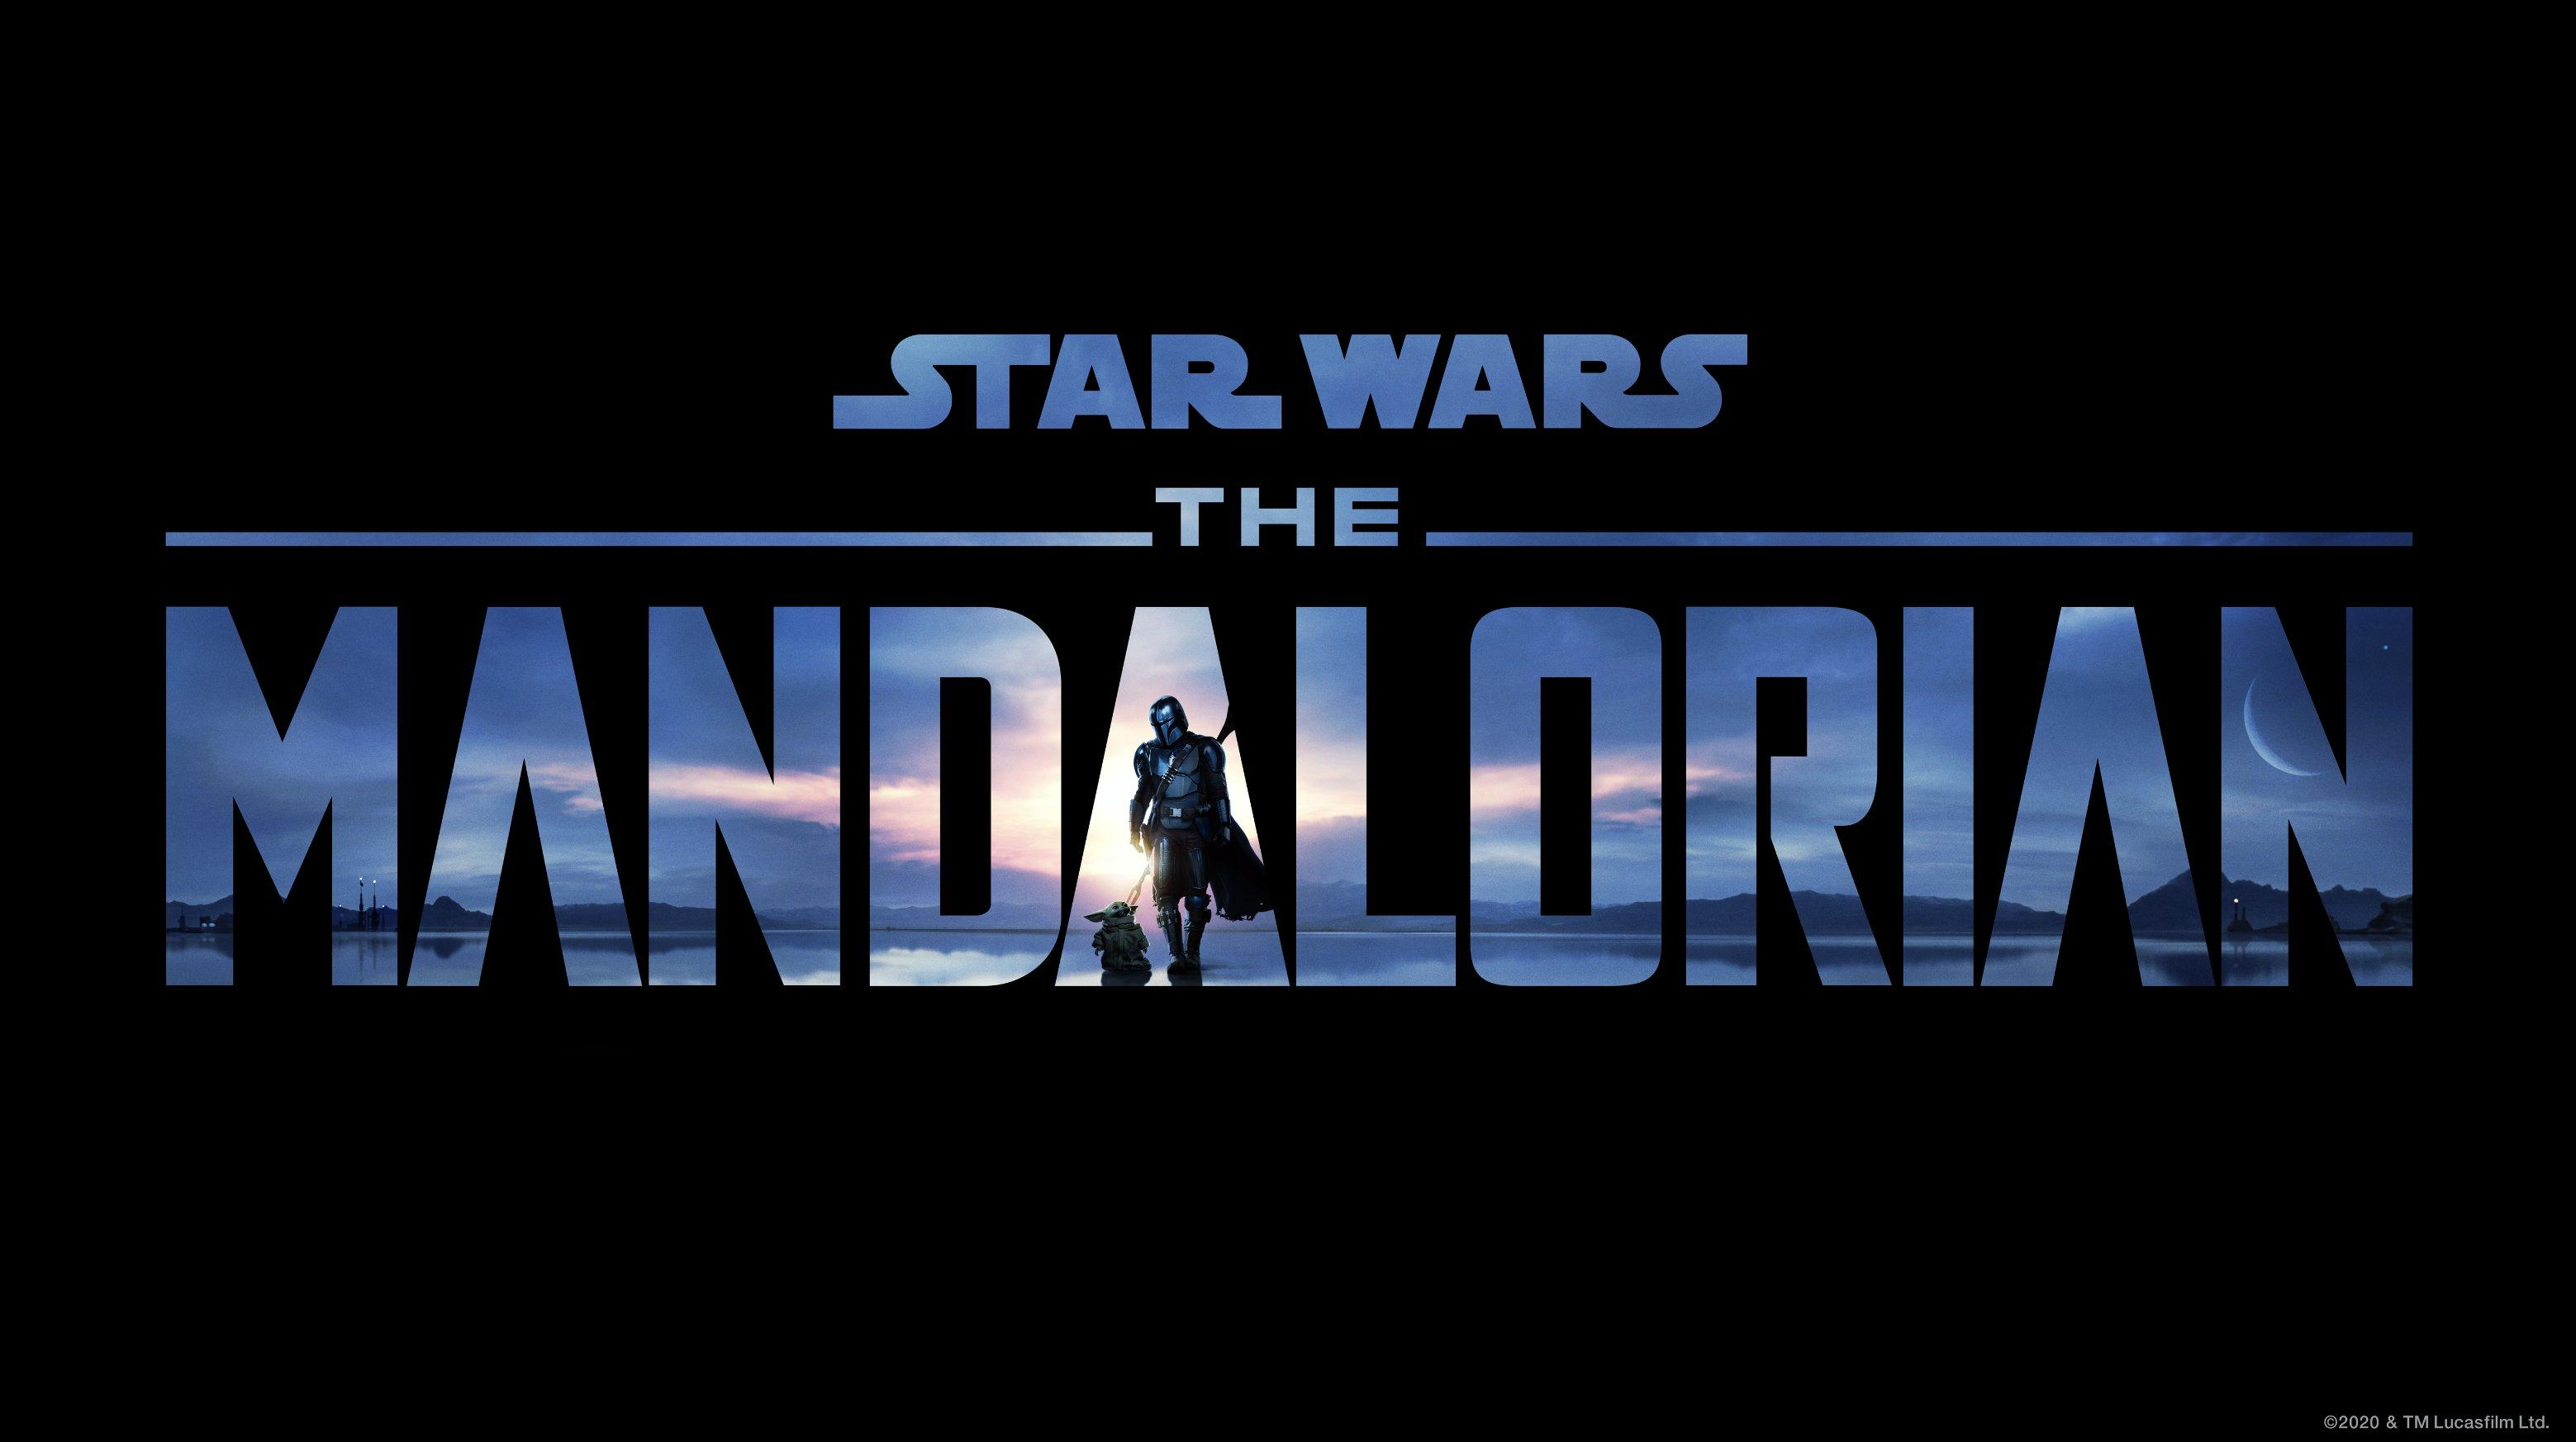 The Mandalorian Season 2 Banner